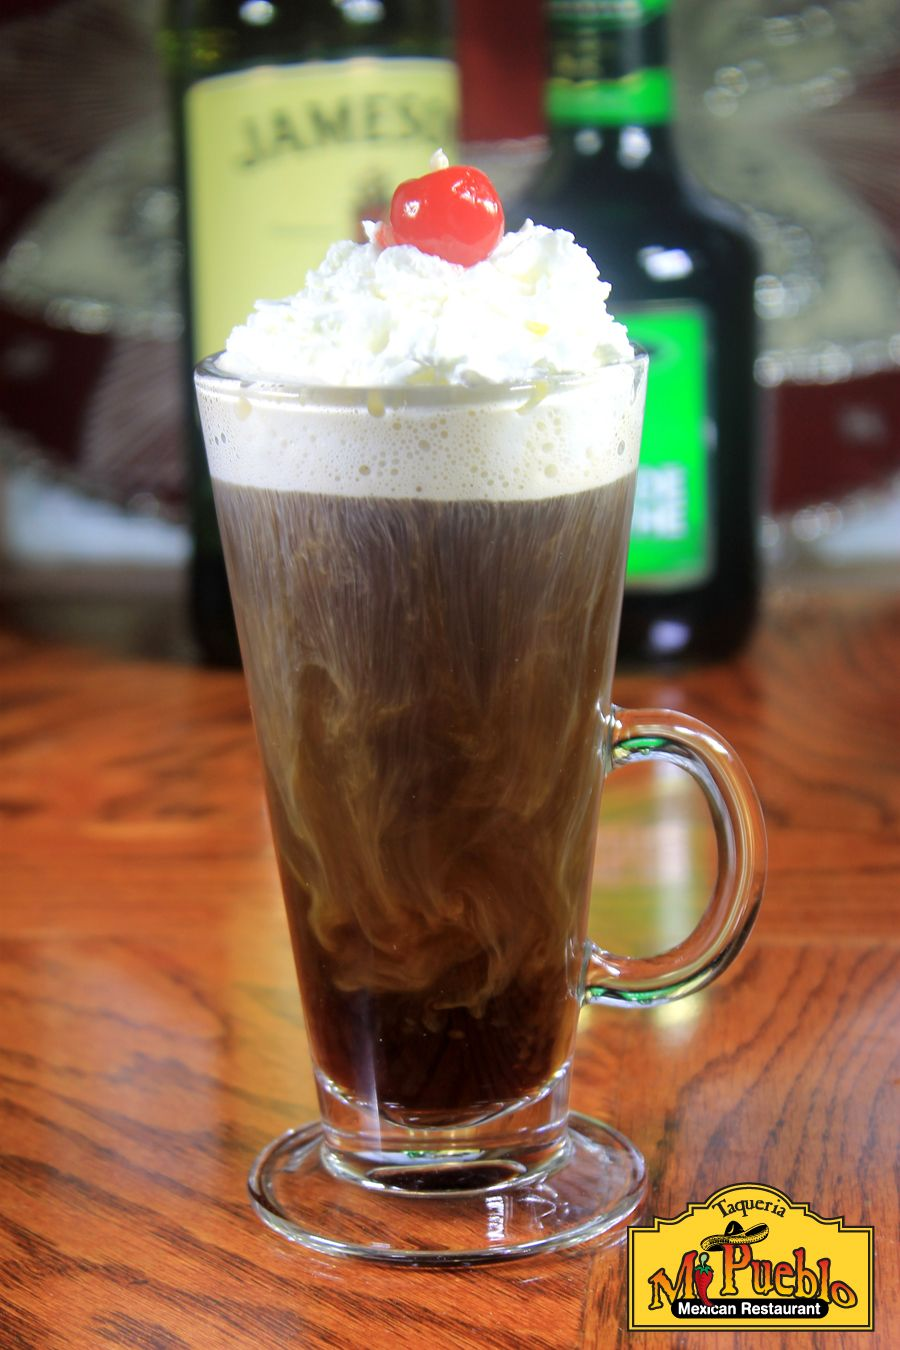 Irish Coffee. Made with Jameson Whiskey coffee and sugar